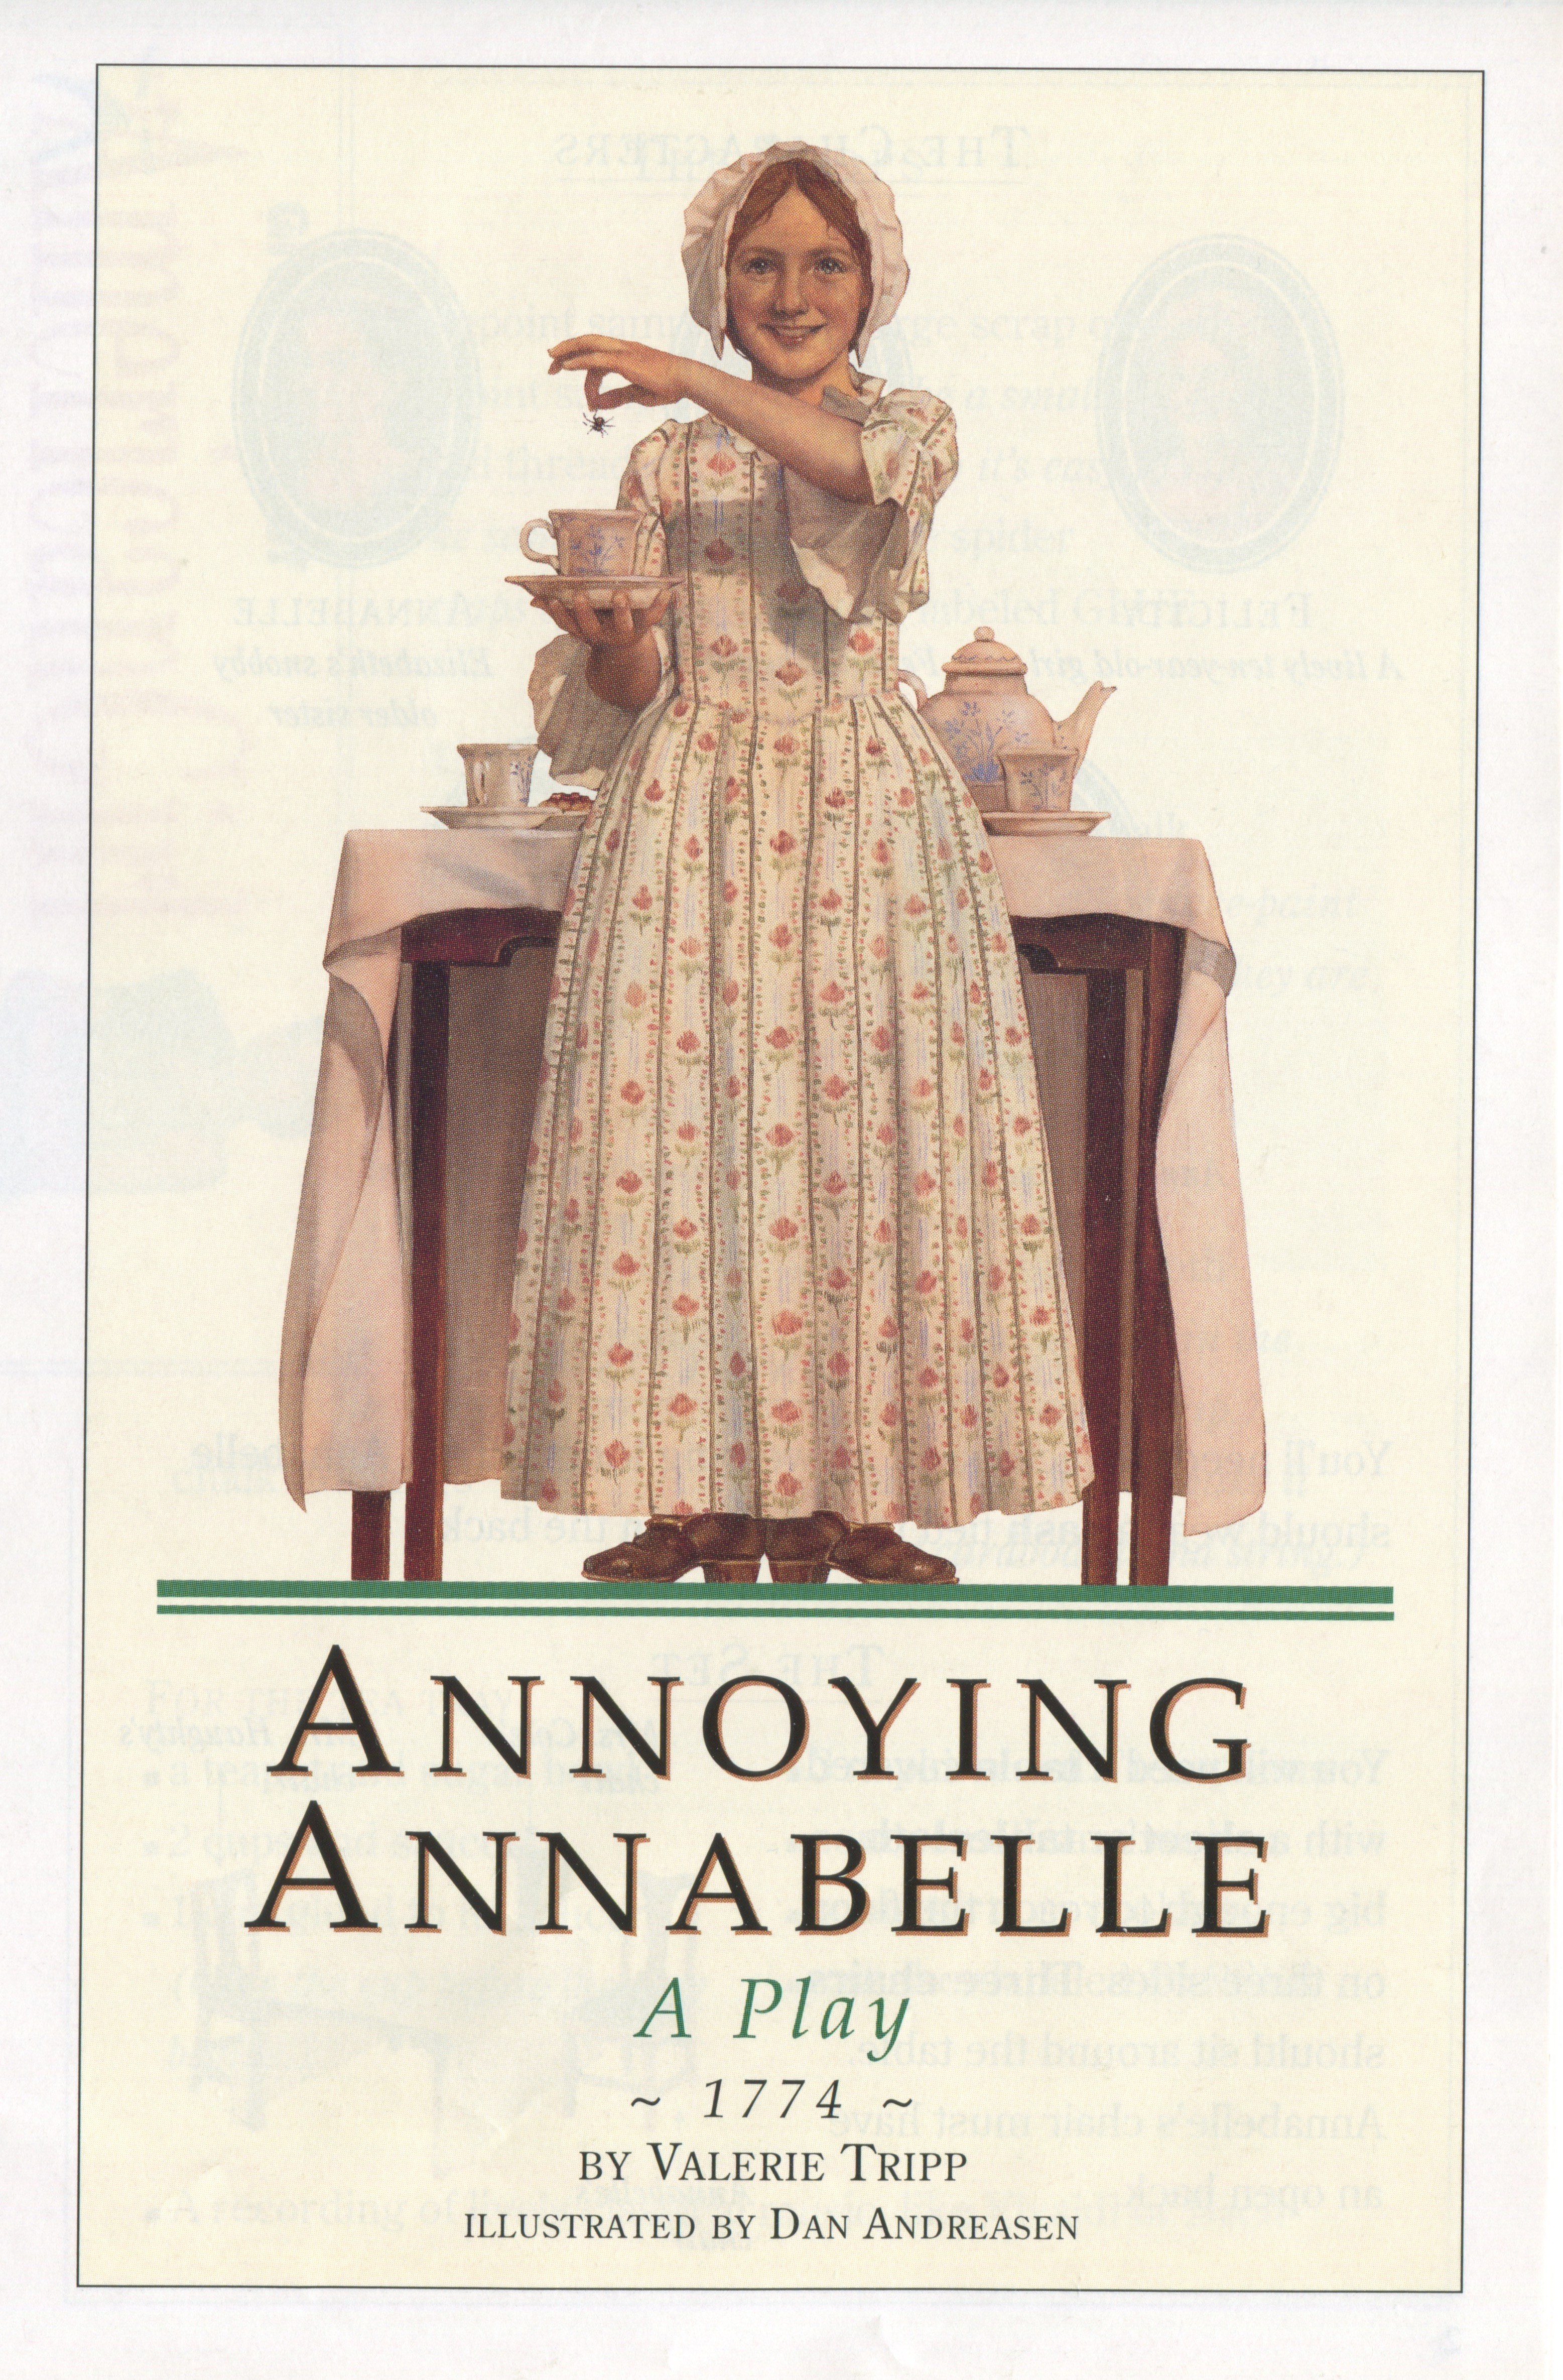 Annoying Annabelle